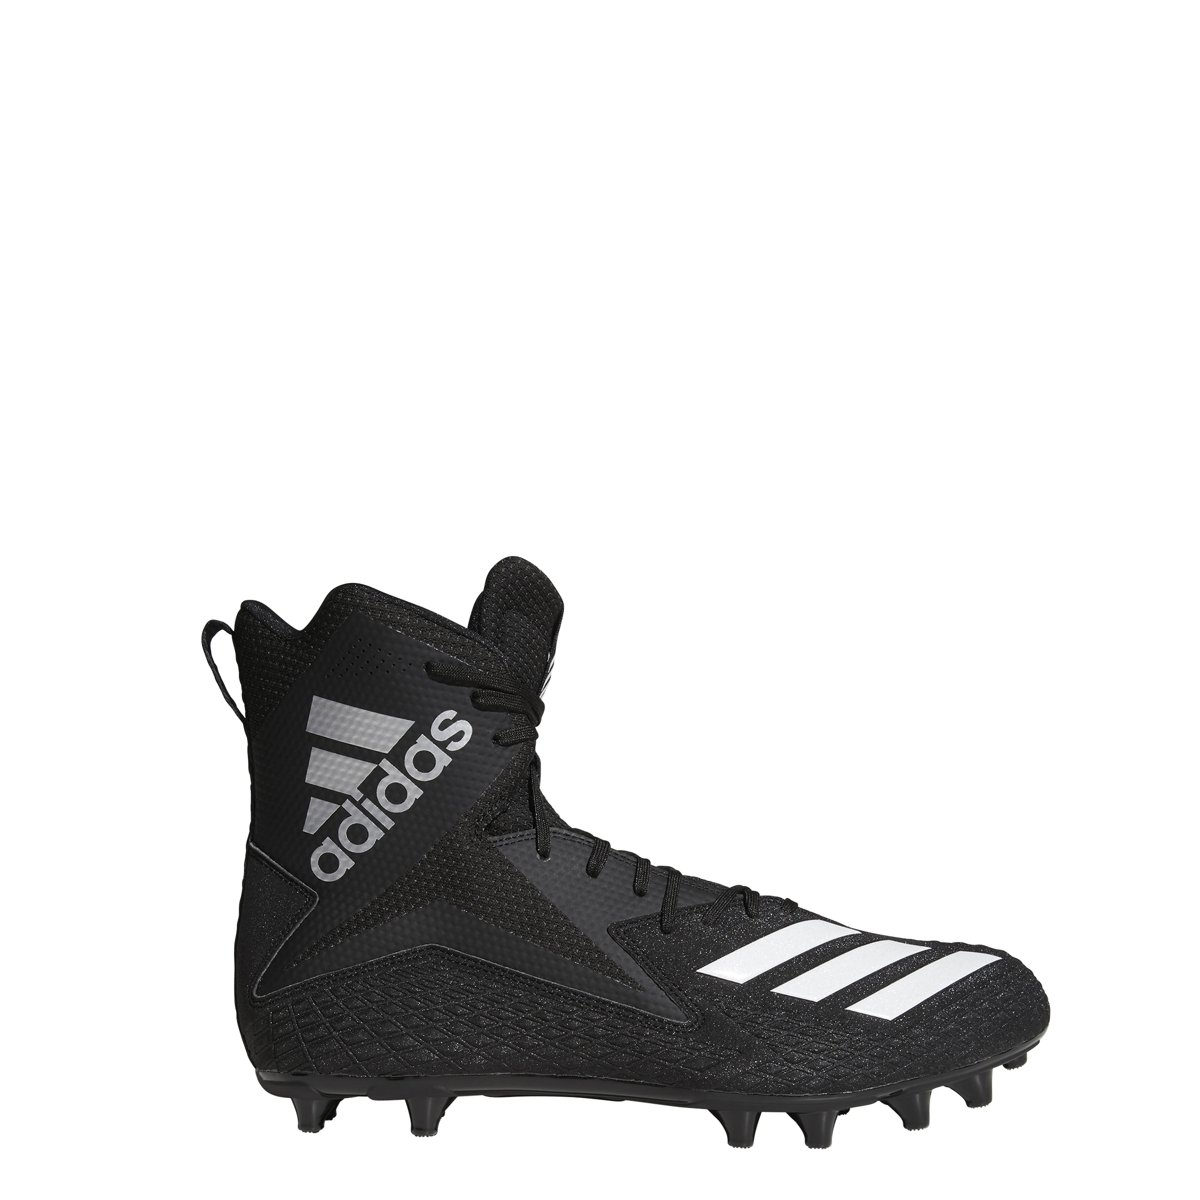 Adidas mostro alto ampia galloccia uomini football b07bhl2y2g 17 d (m) us